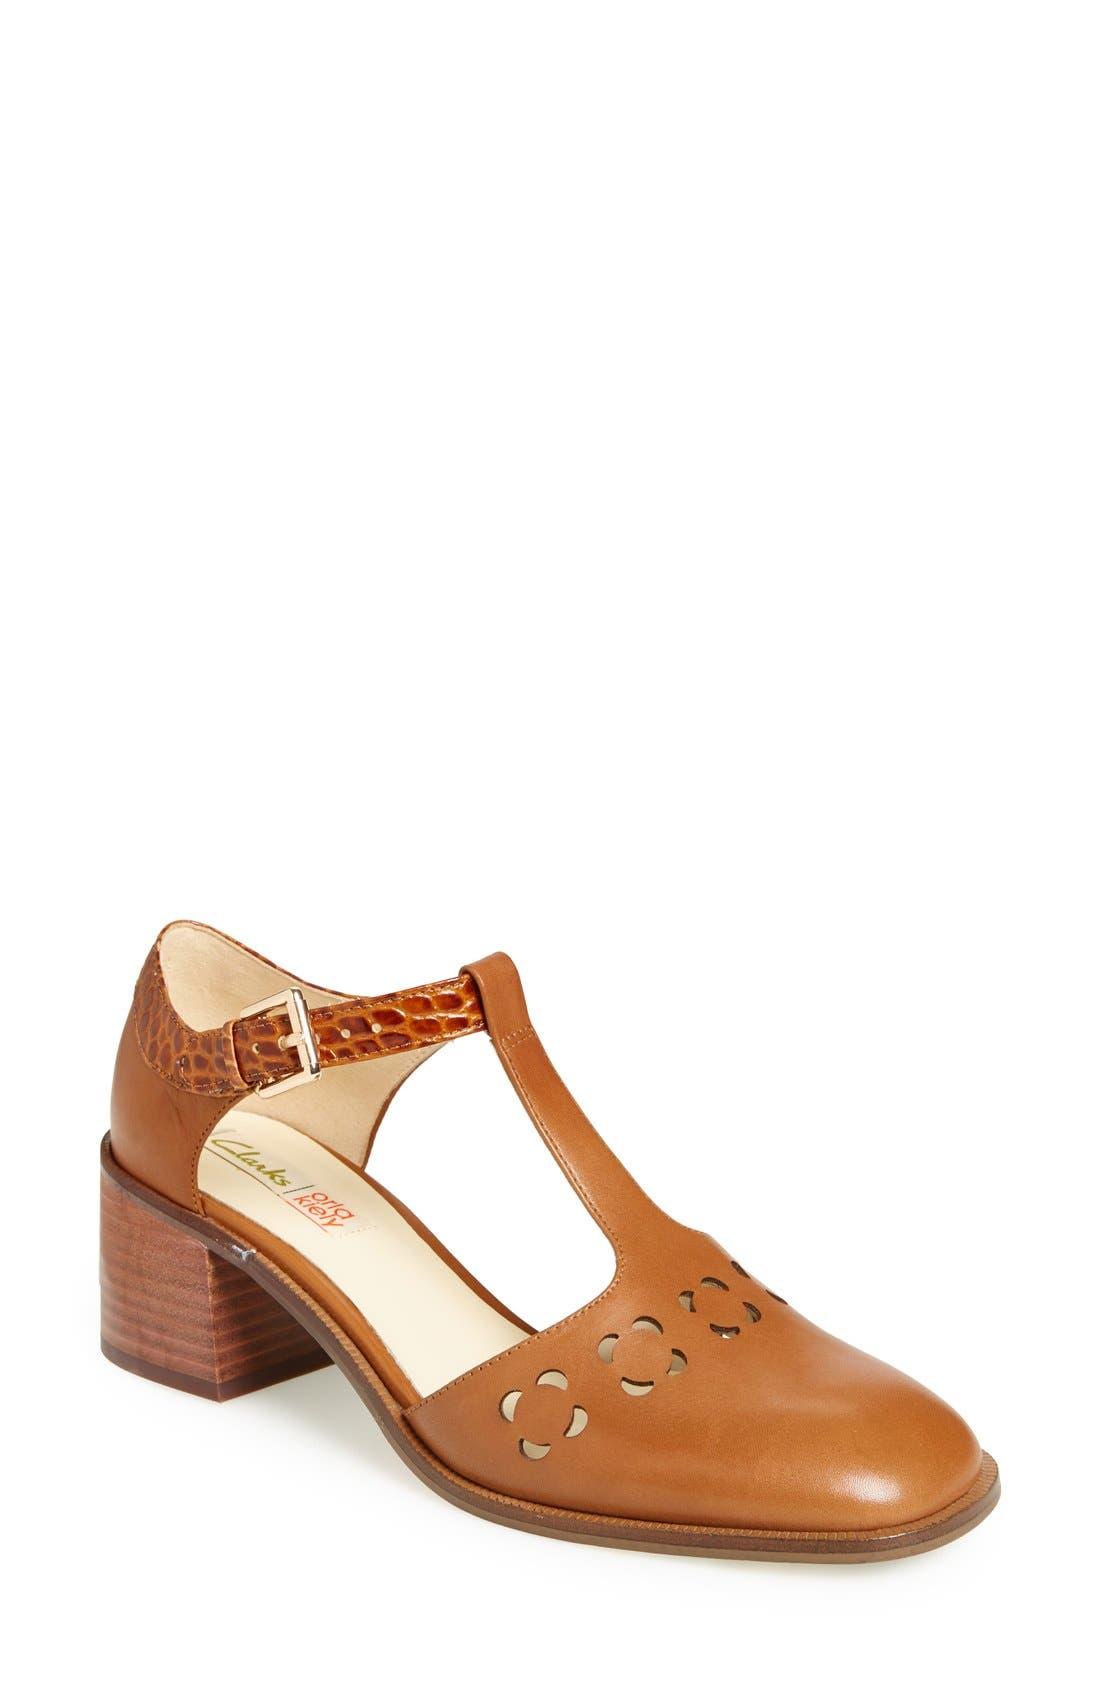 Clarks<sup>®</sup> x Orla Kiely 'Bibi' Leather T-Strap Sandal,                             Main thumbnail 1, color,                             200